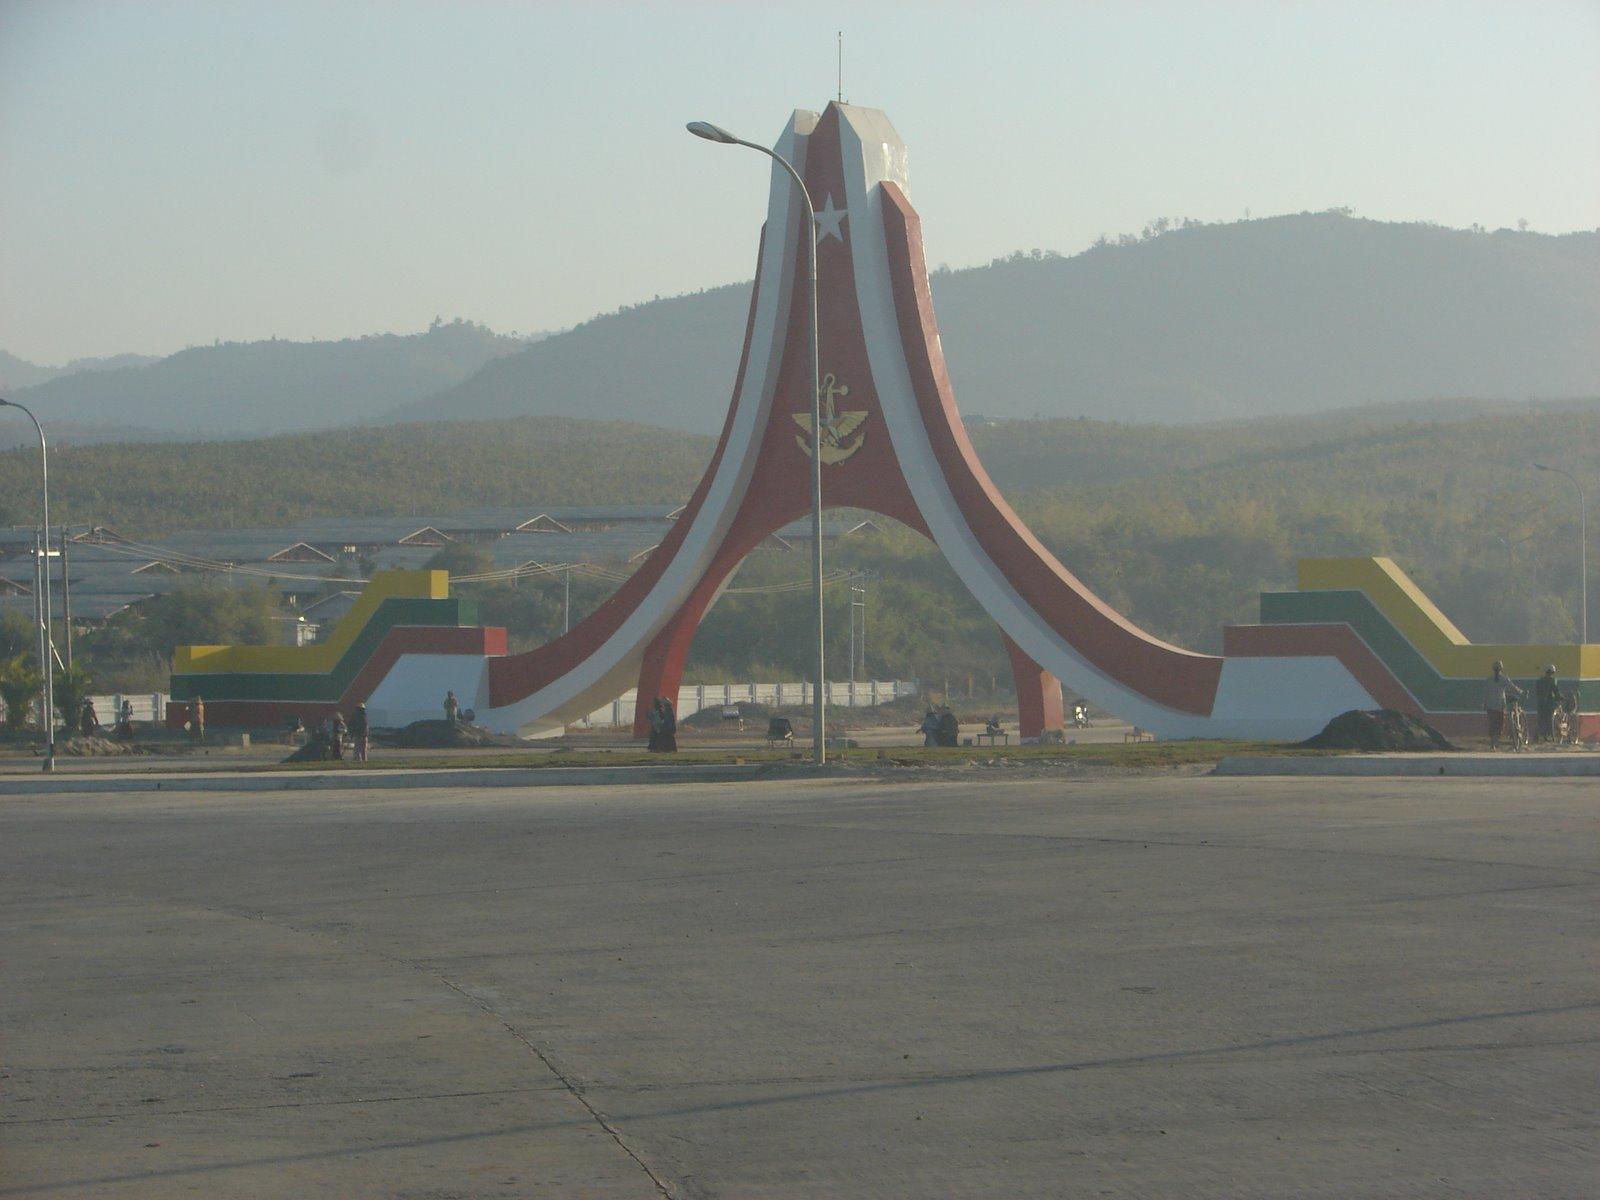 [Myanmar-Napyitaw-Jan+2006+023+--+Ceremonial+gate+at+the+entrance+of+Naypyitaw]